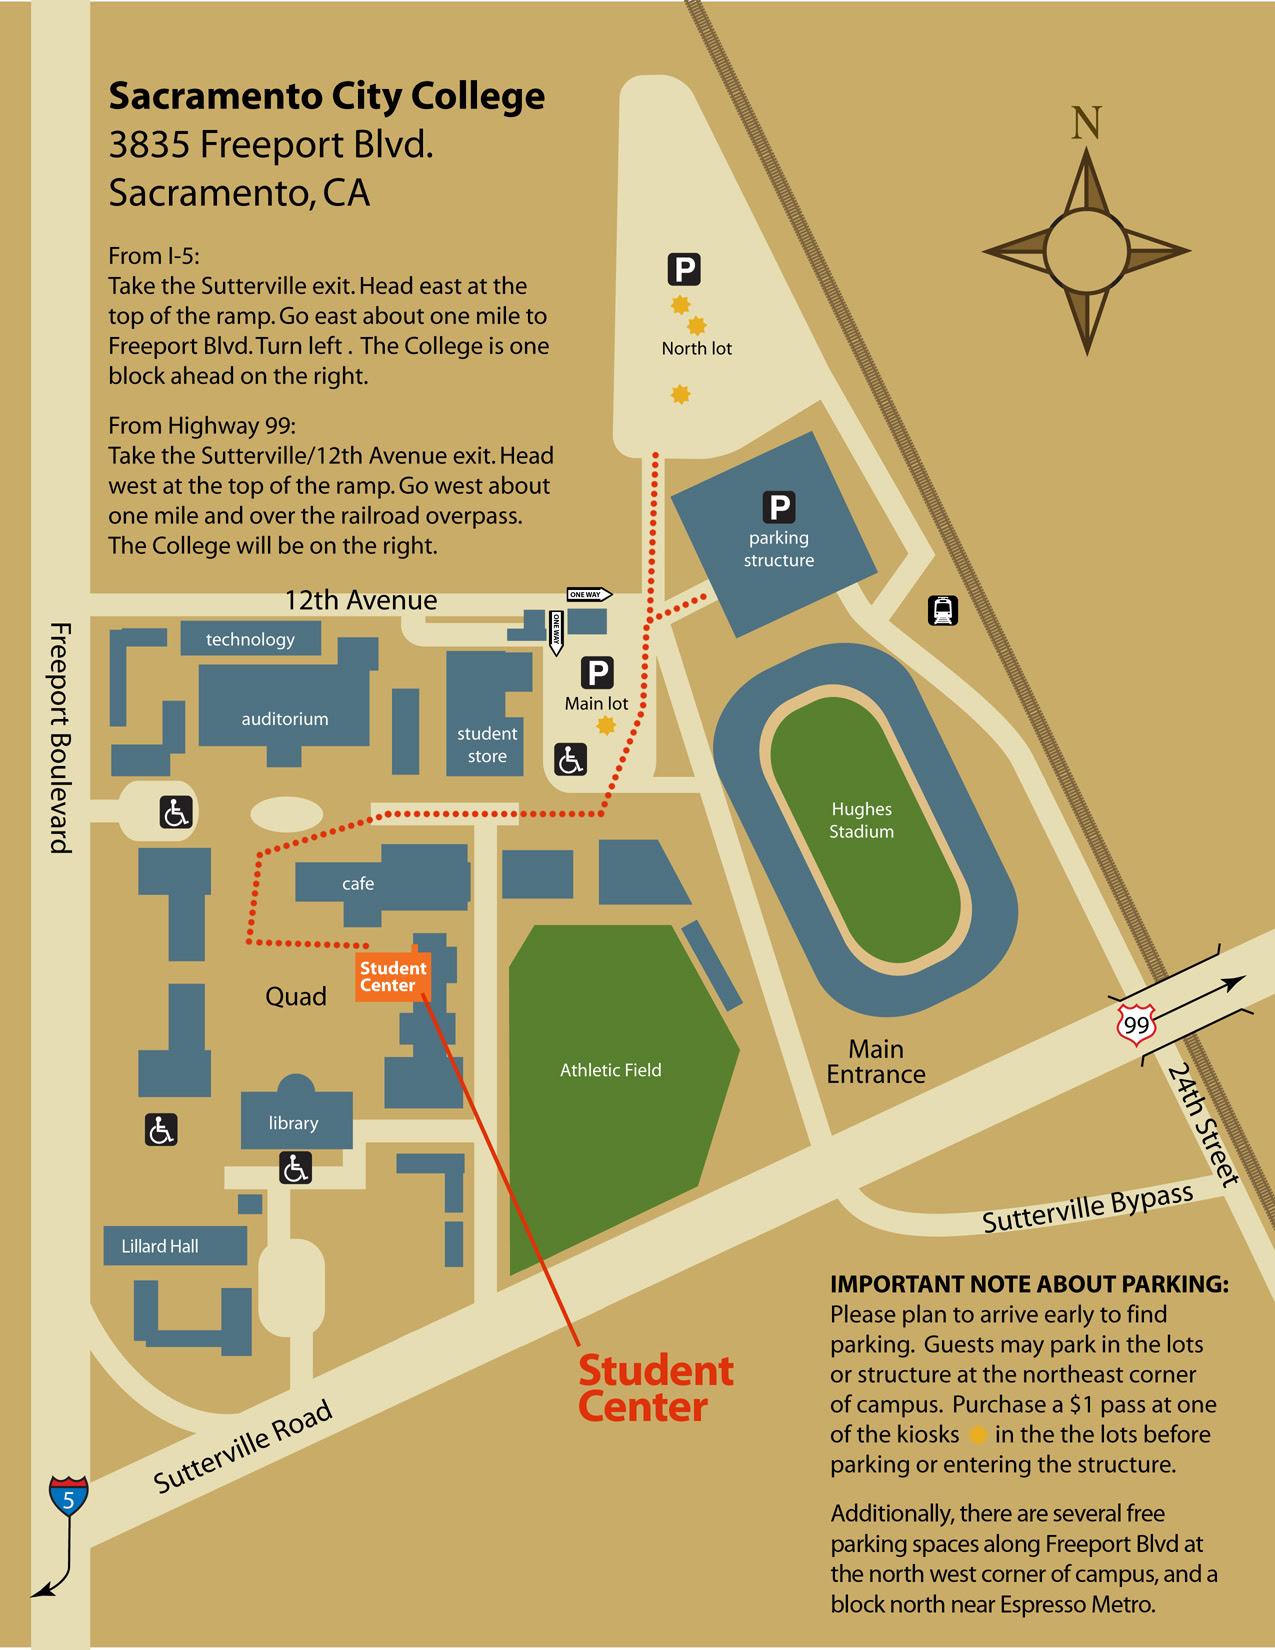 Sac City Campus Map Sacramento City College Map | Gadgets 2018